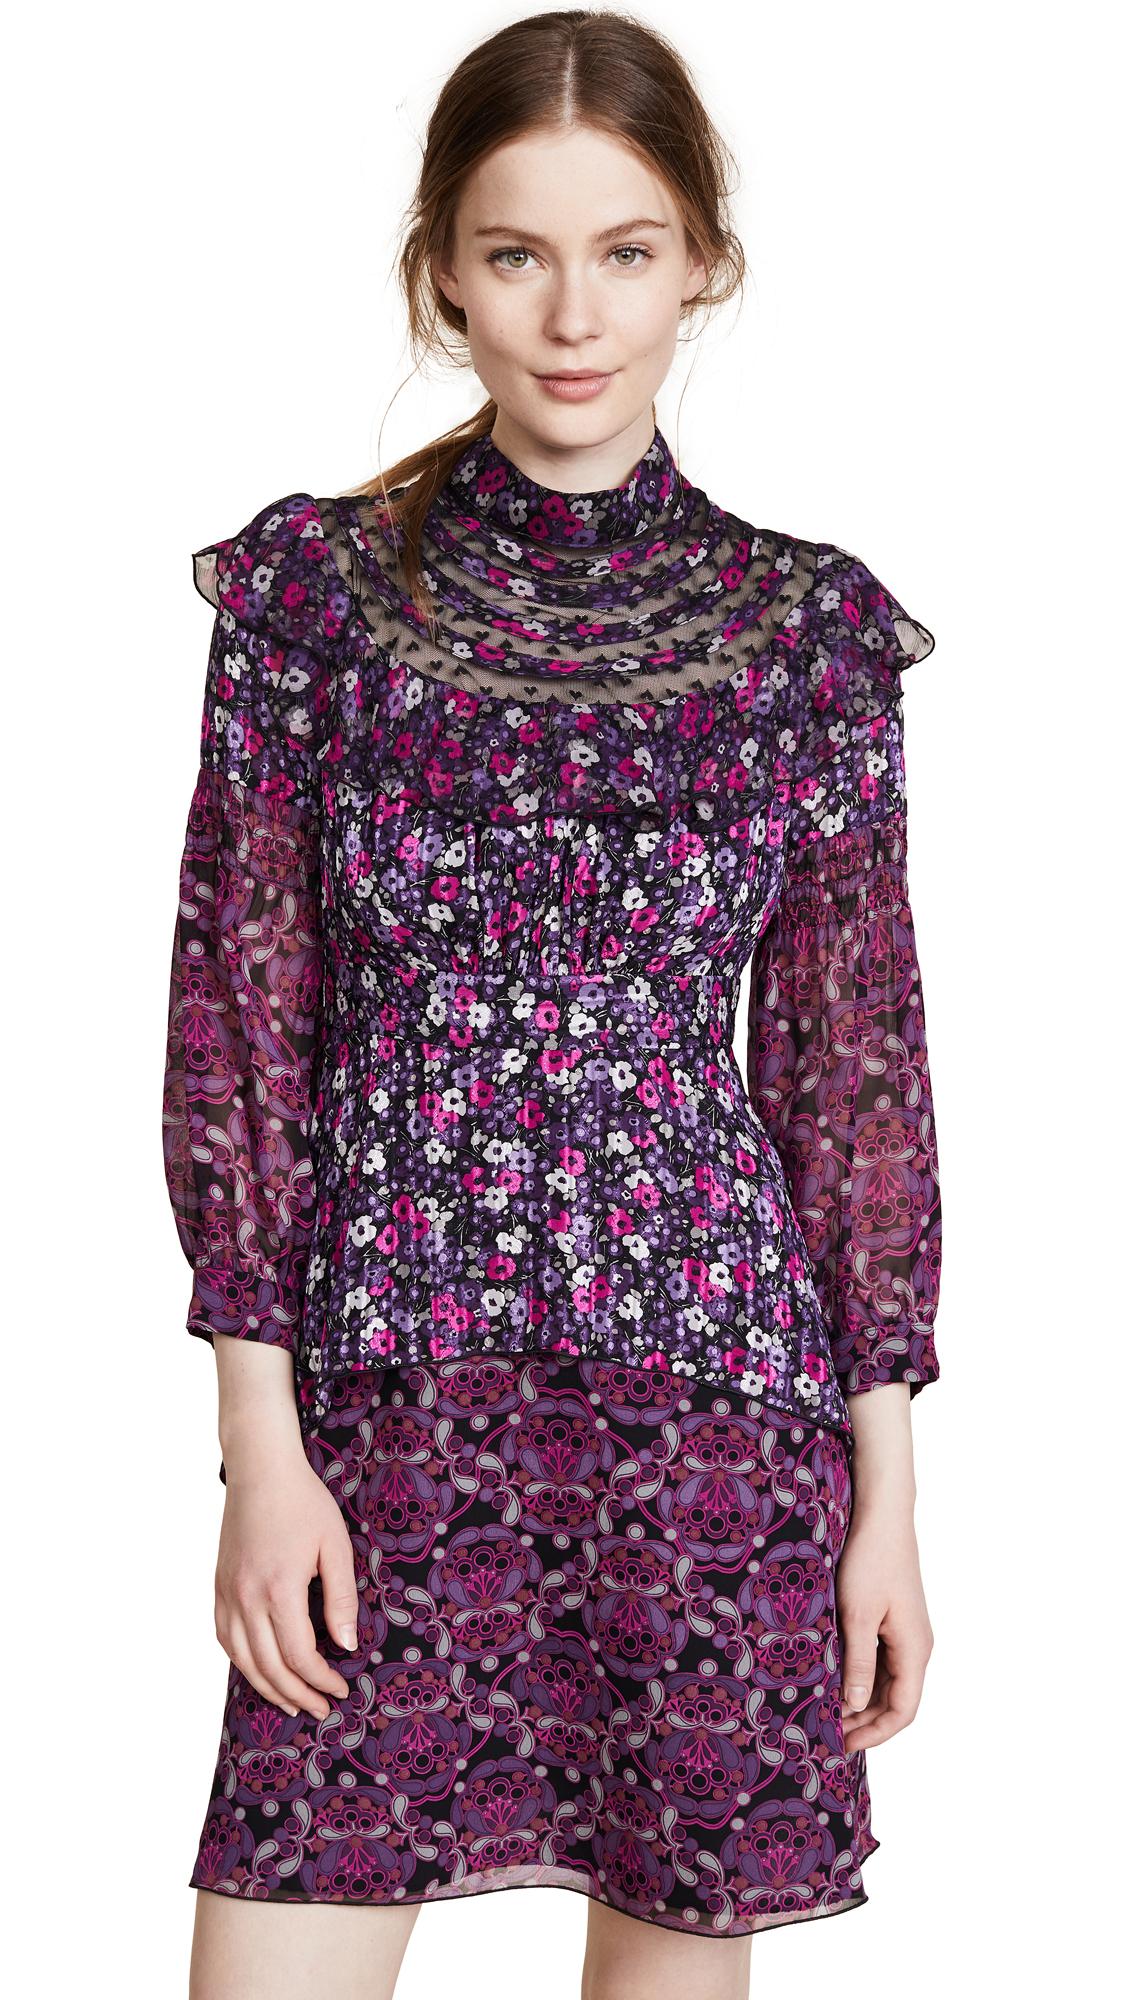 Anna Sui Joy Dress In Iris Multi